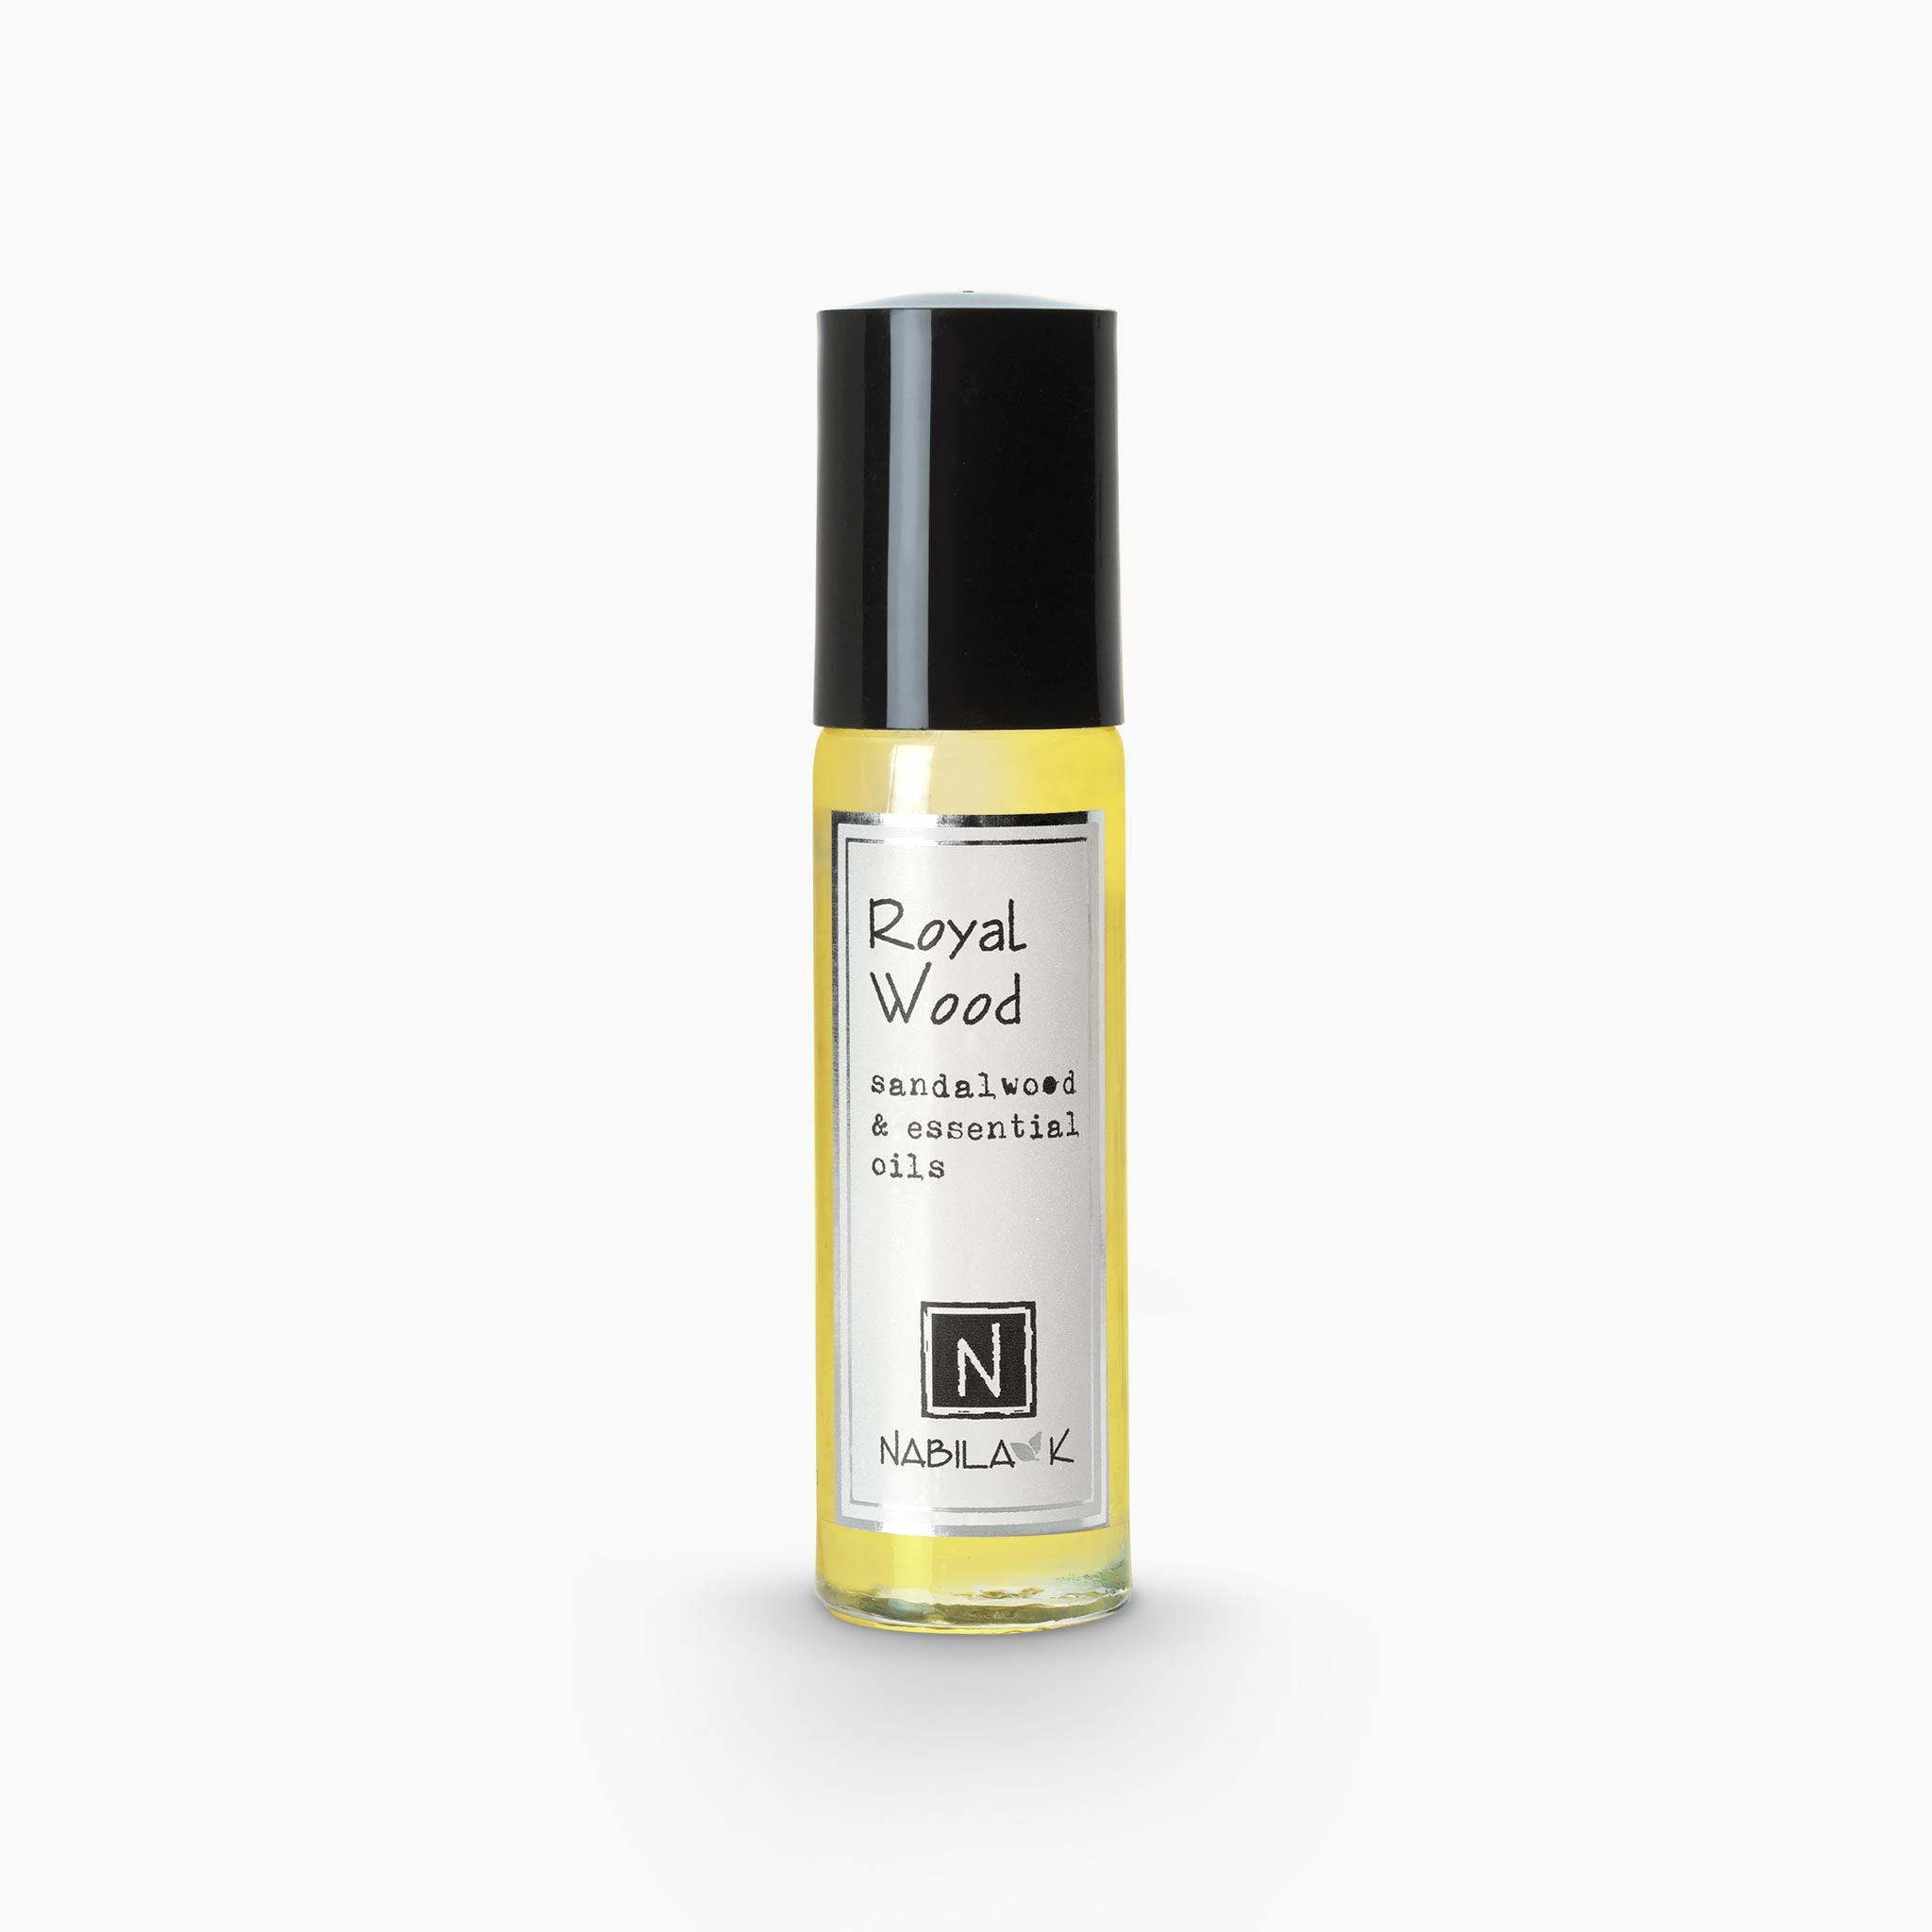 .33oz of Nabila K's Royal Wood Sandalwood and Essential Oils Roll on Perfume